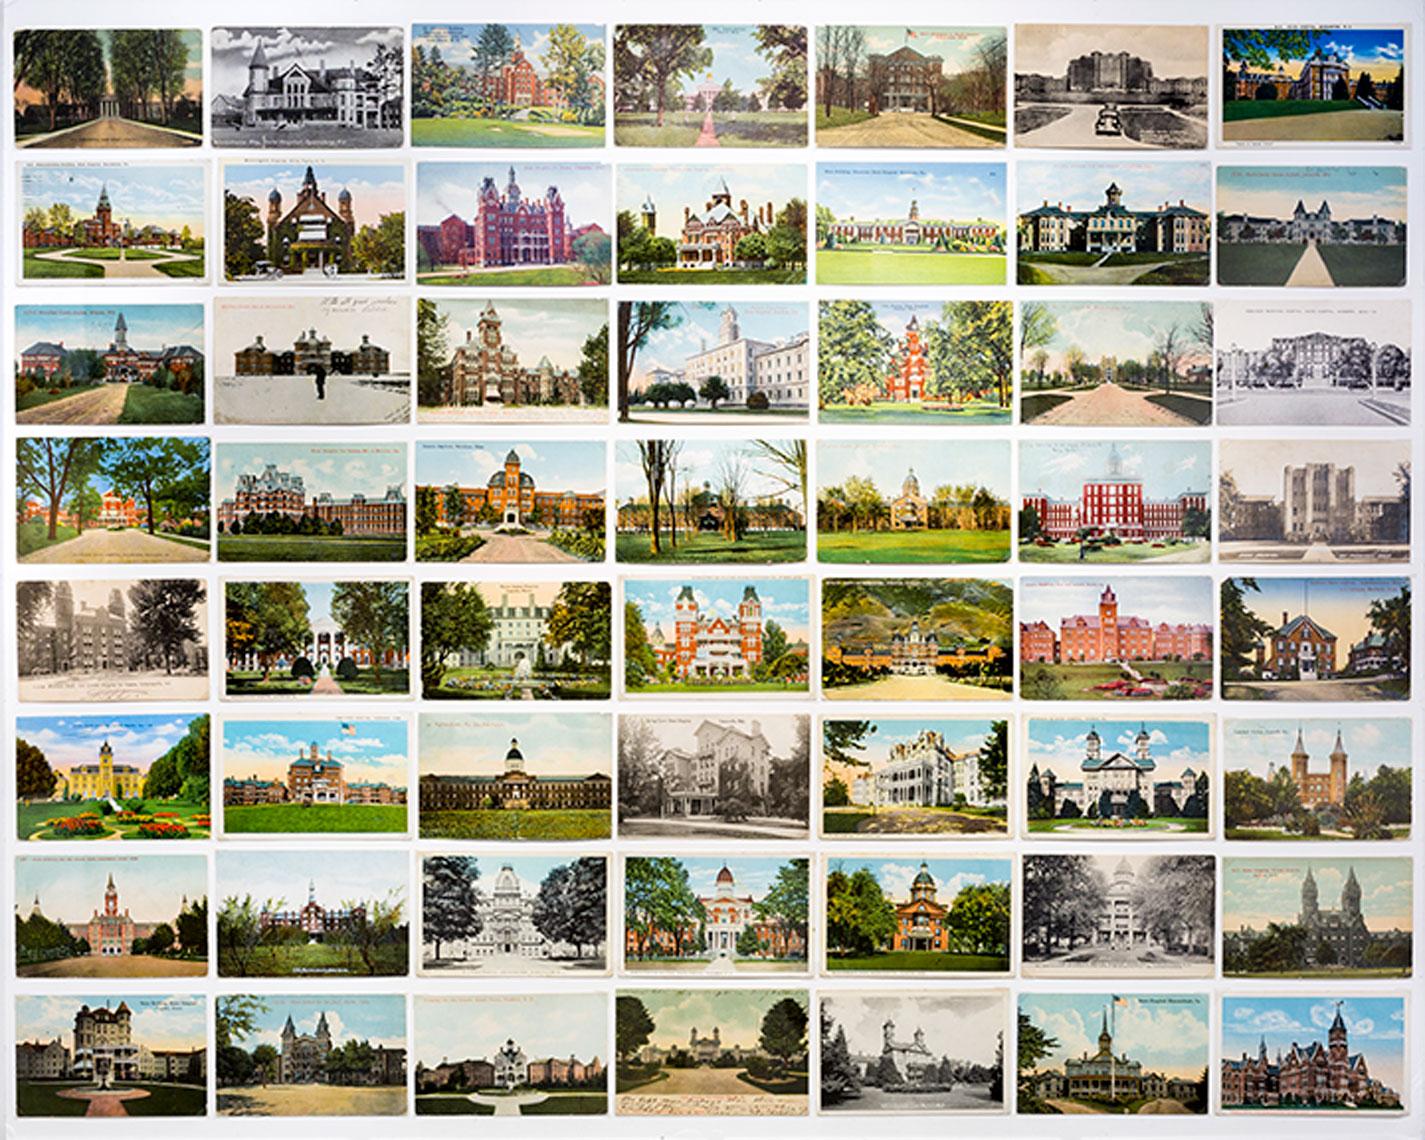 Vintage postcards,  Asylum , Benrubi Gallery, New York, NY, 2016